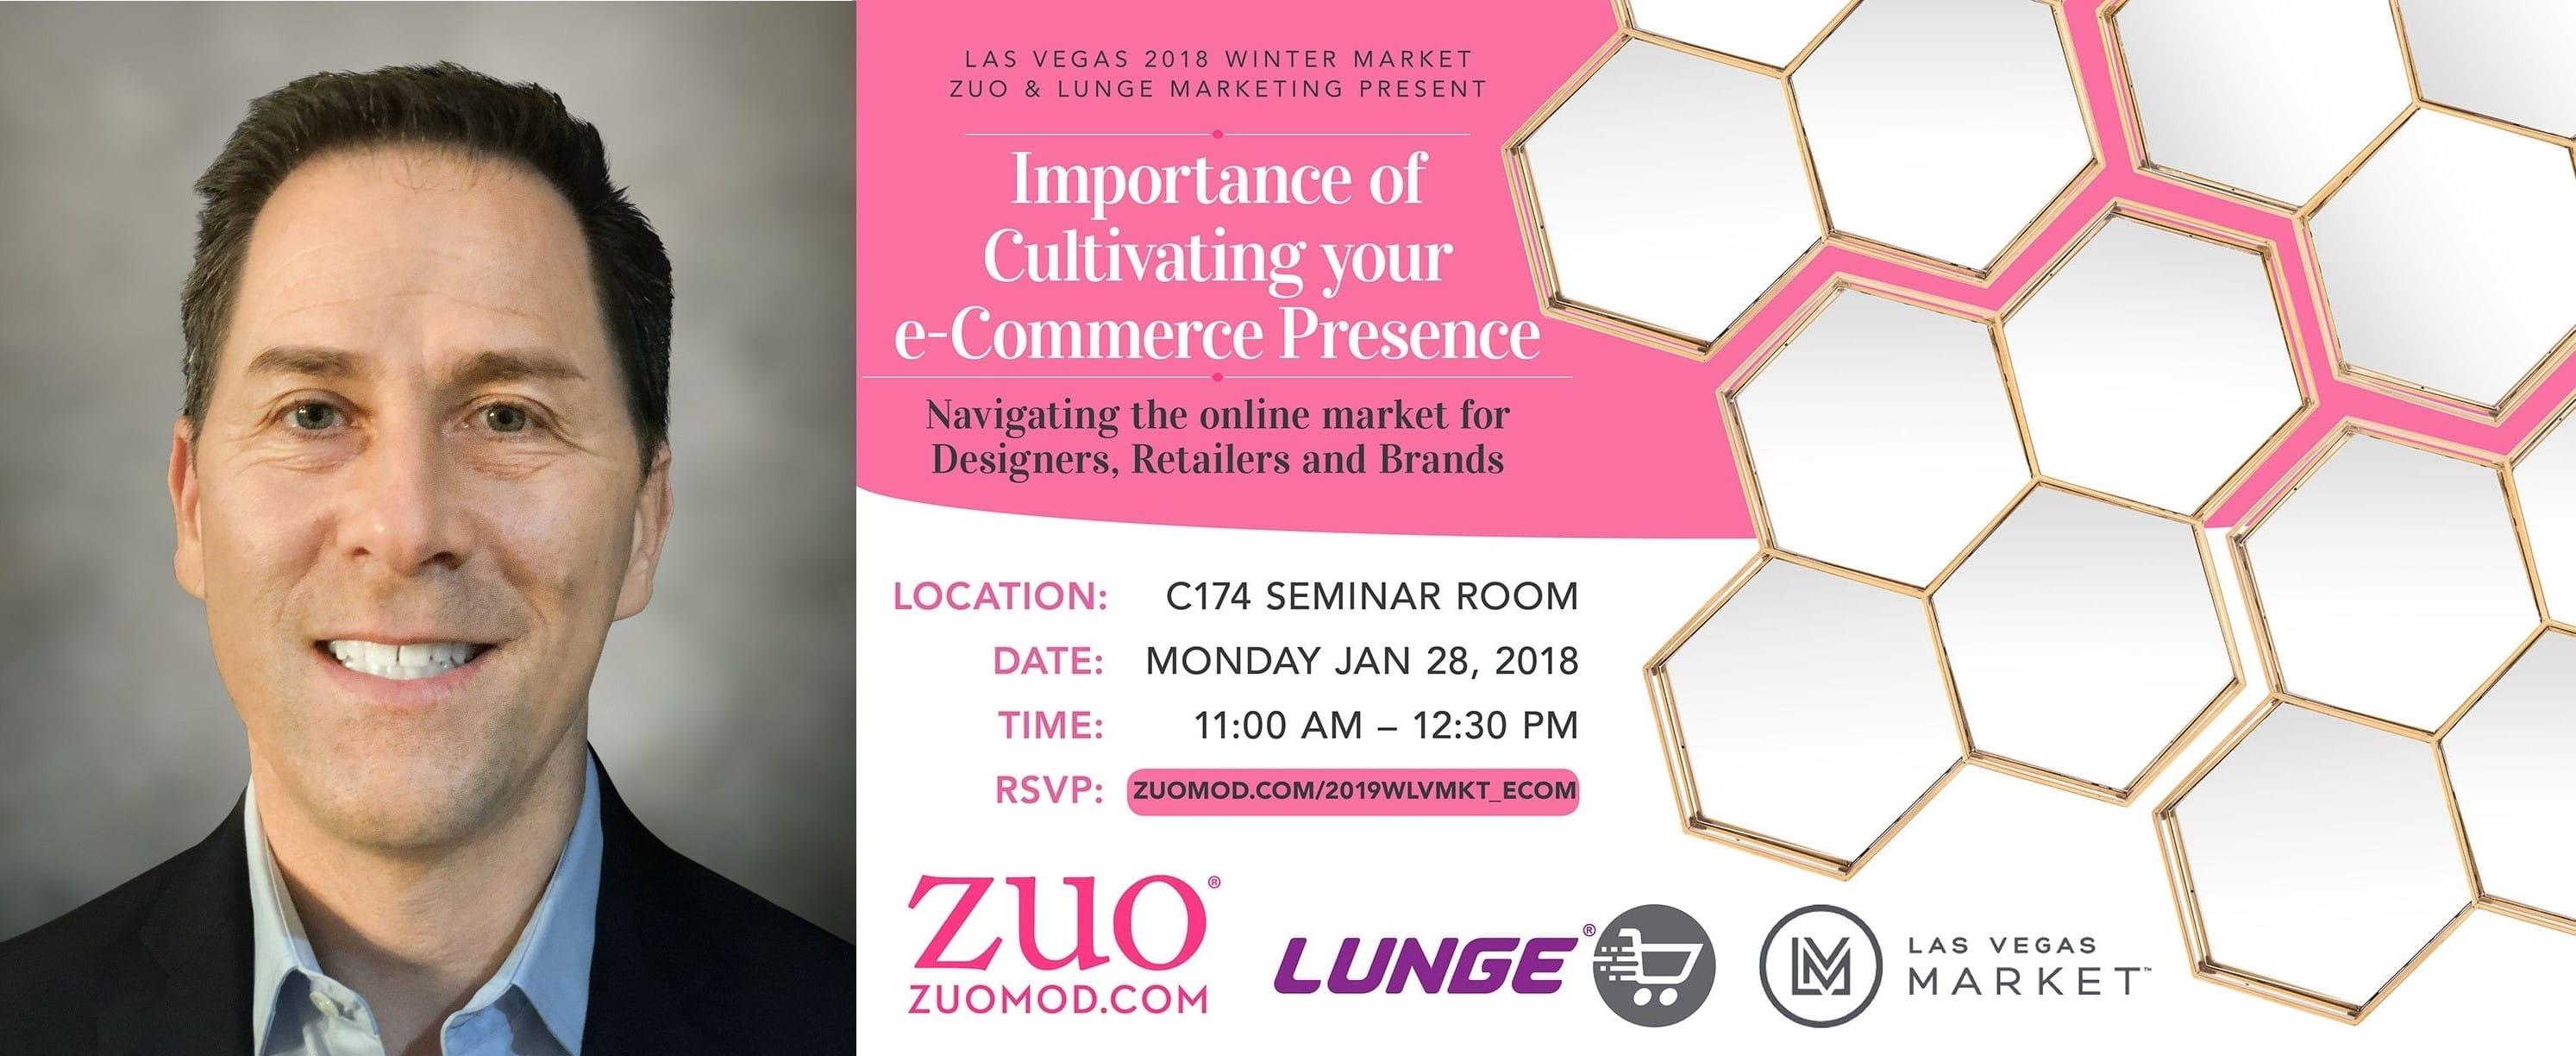 ZUO Announces Kevin Baum as their new EVP, e-Commerce